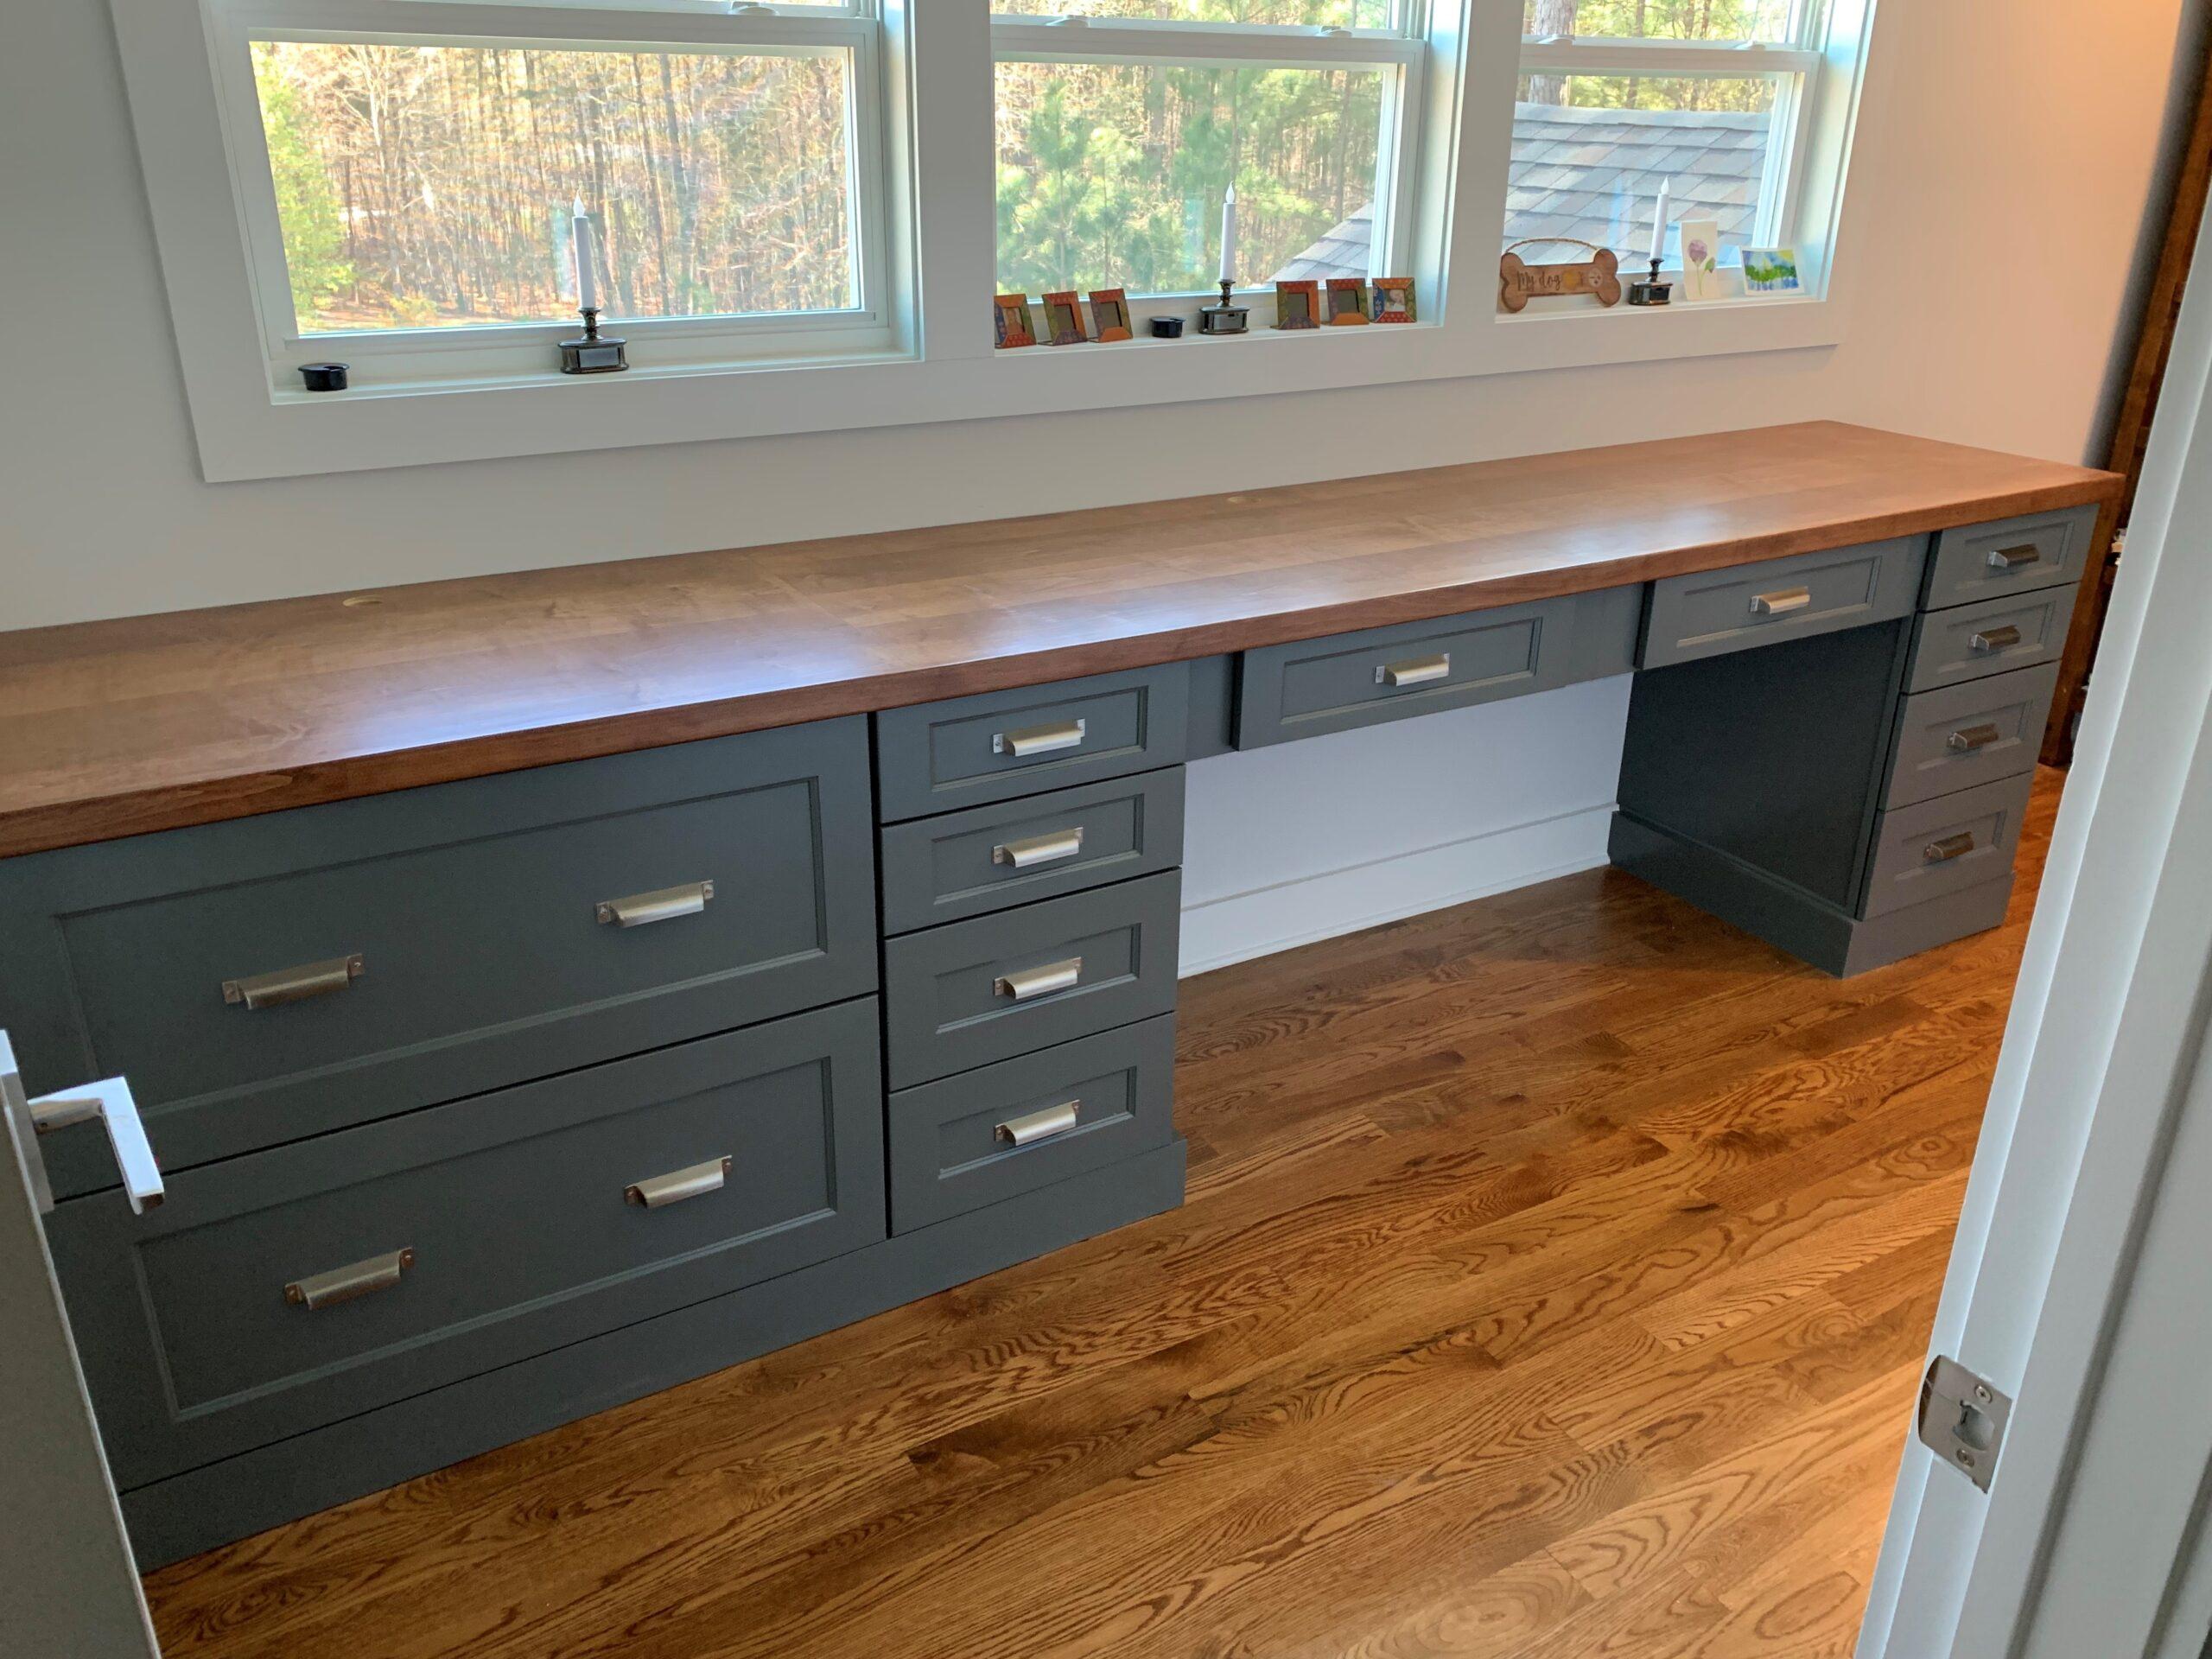 Kitchen Cabinets Raleigh Modern Custom Office Desk Hampton Greystone Paint Wood Top File Drawers